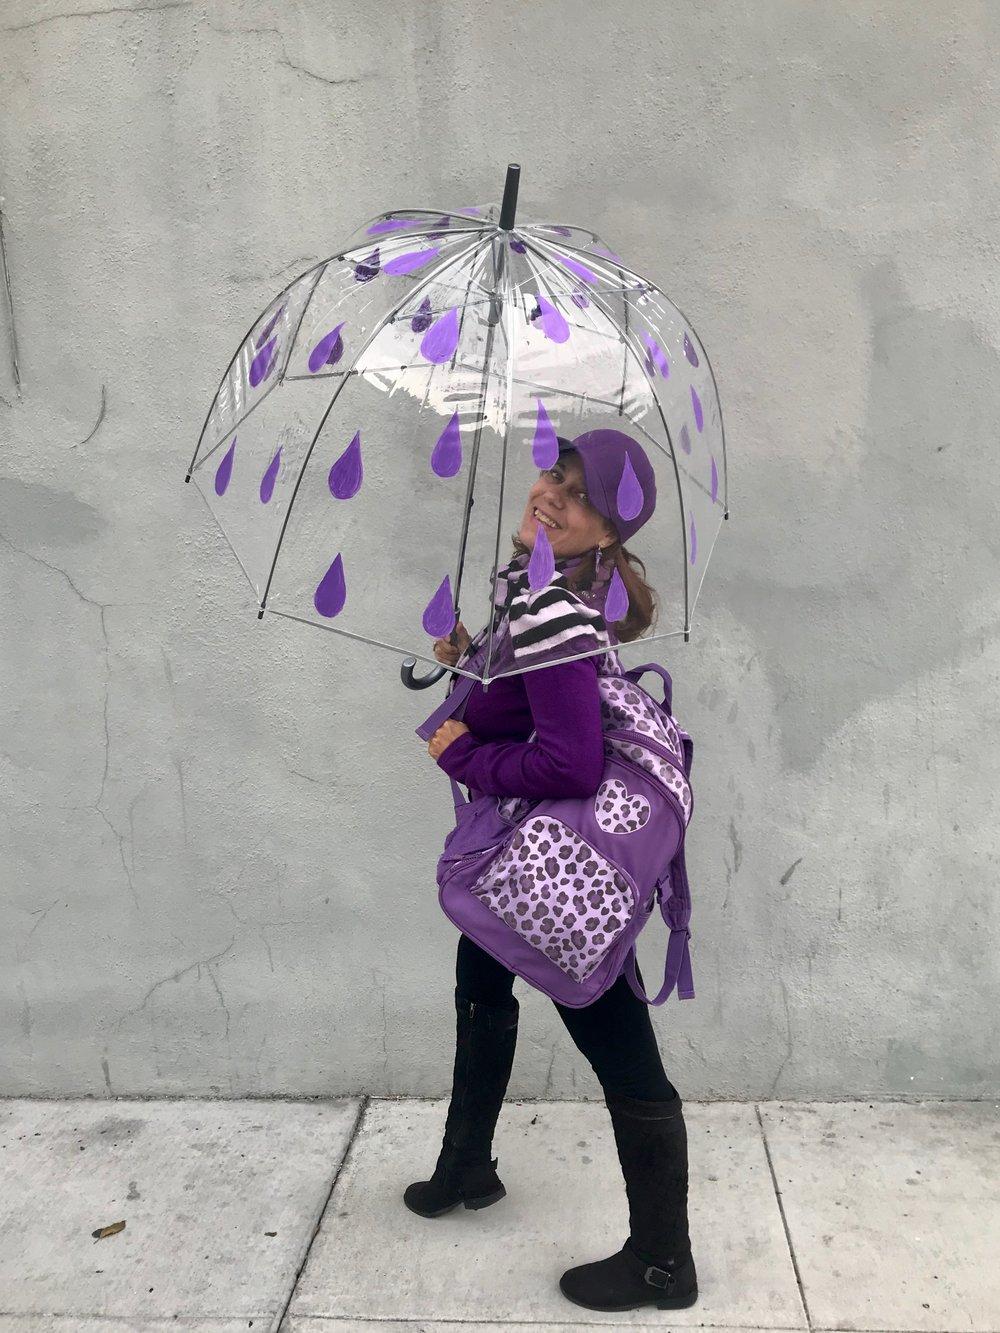 Day 338. I painted a Purple Rain Umbrella